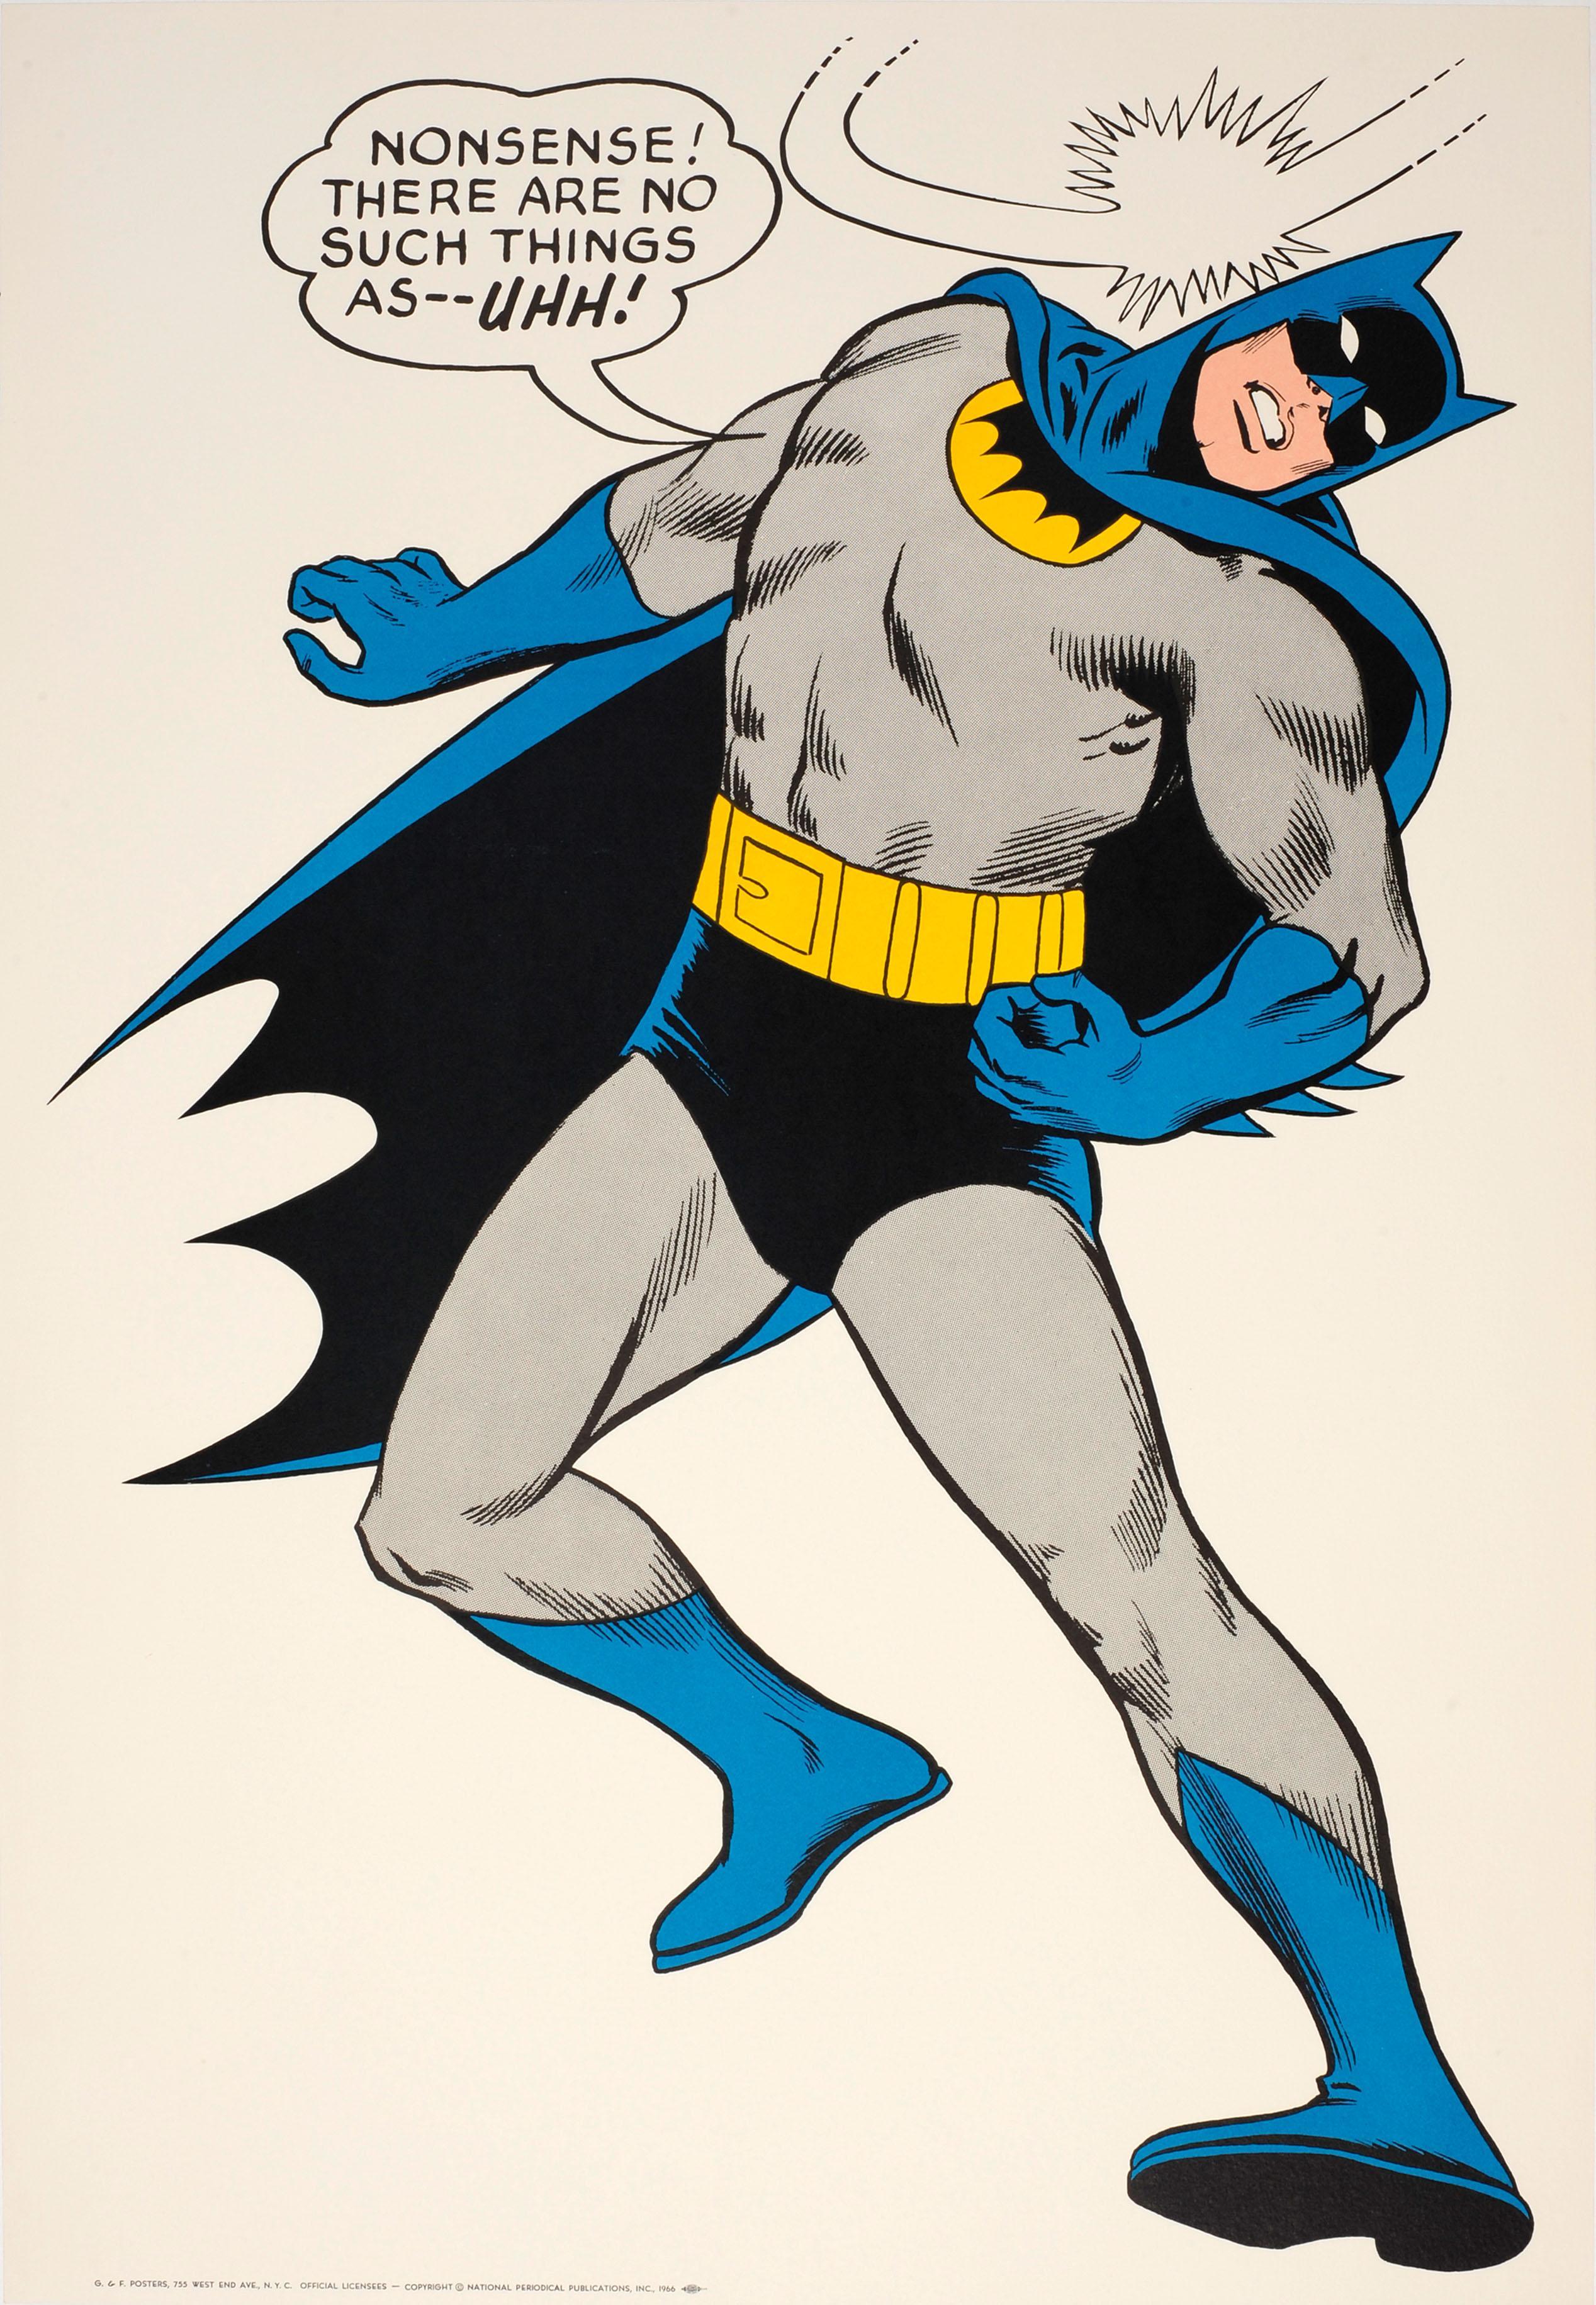 "Original Vintage Cartoon Batman Poster For The Iconic Comic Superhero ""...Uhh!"""